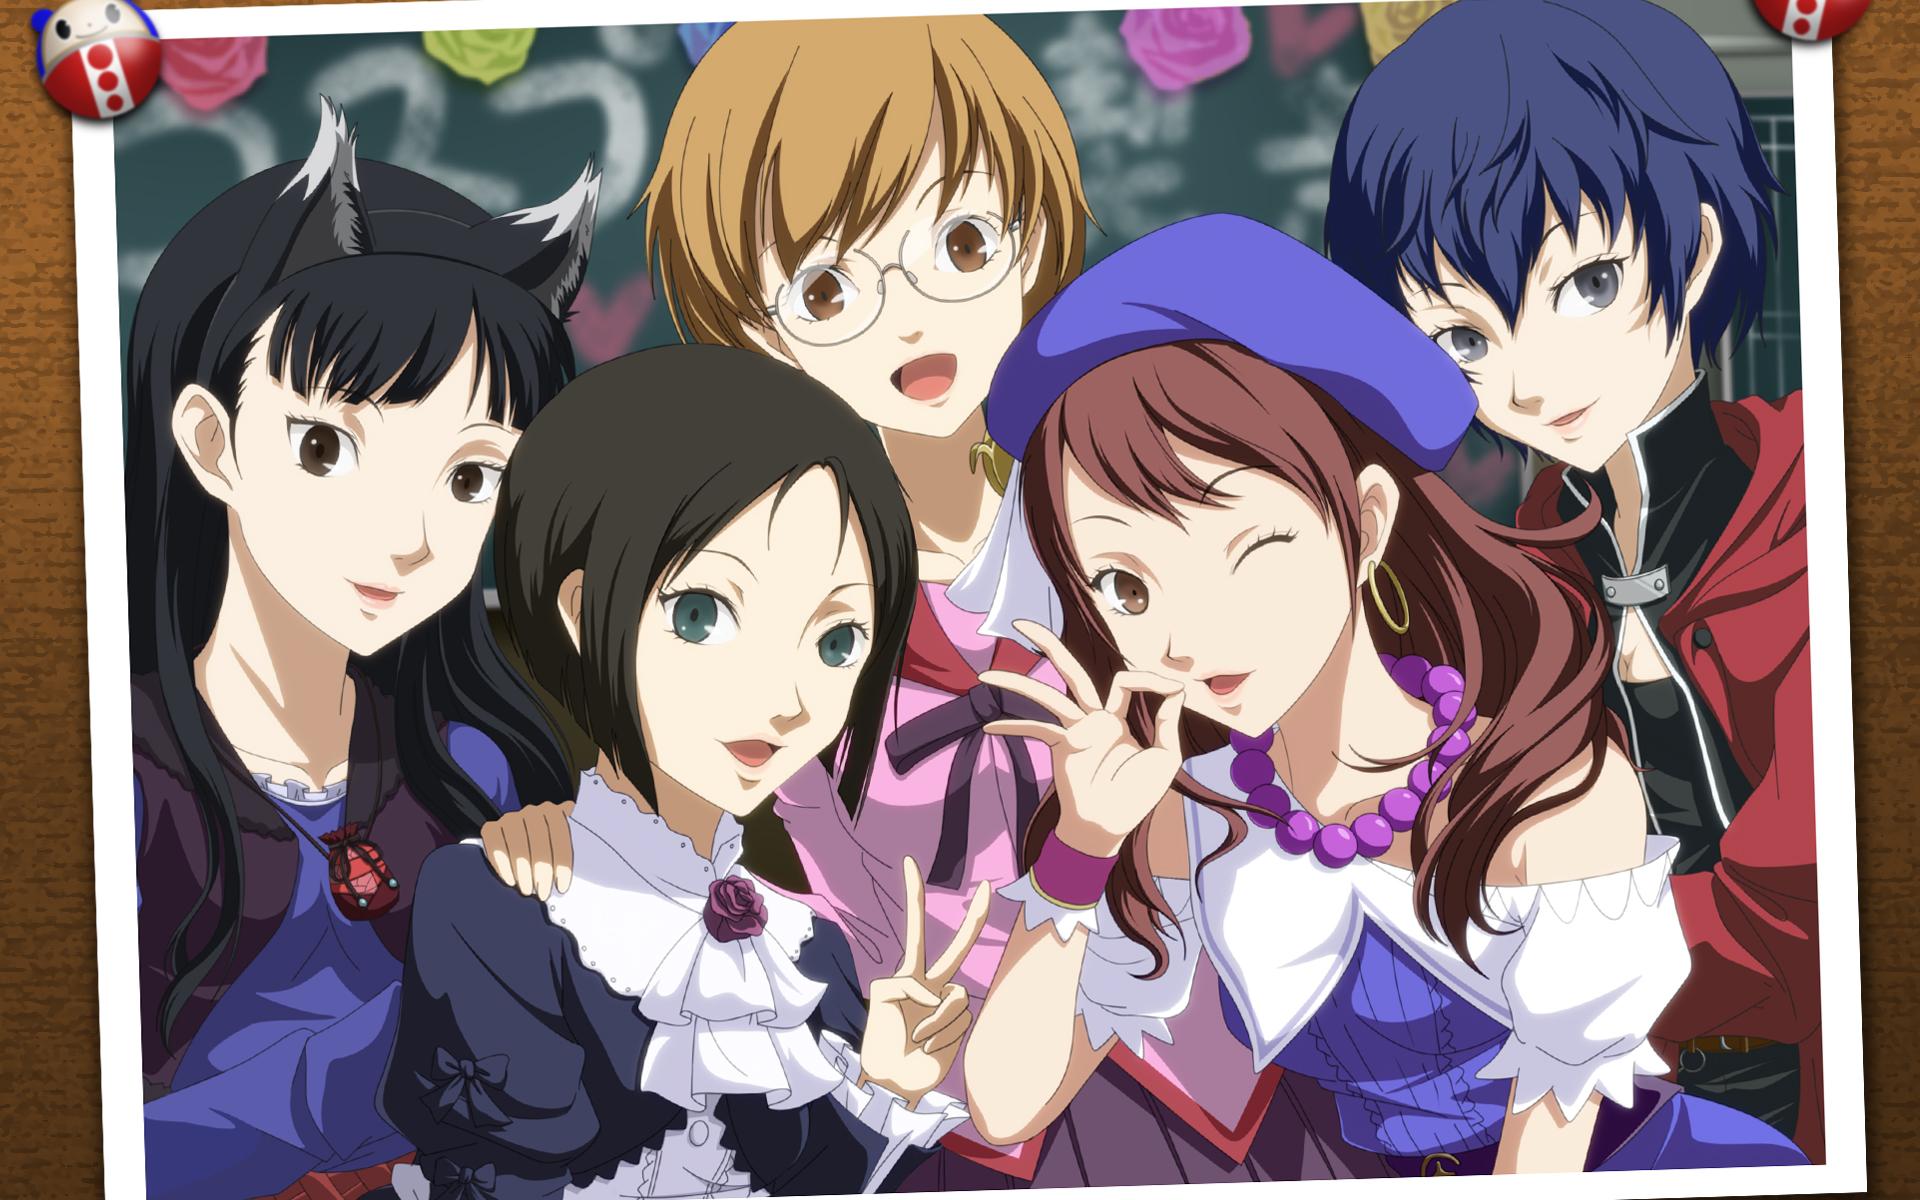 Persona 4 Anime Characters : Shin megami tensei persona wallpaper